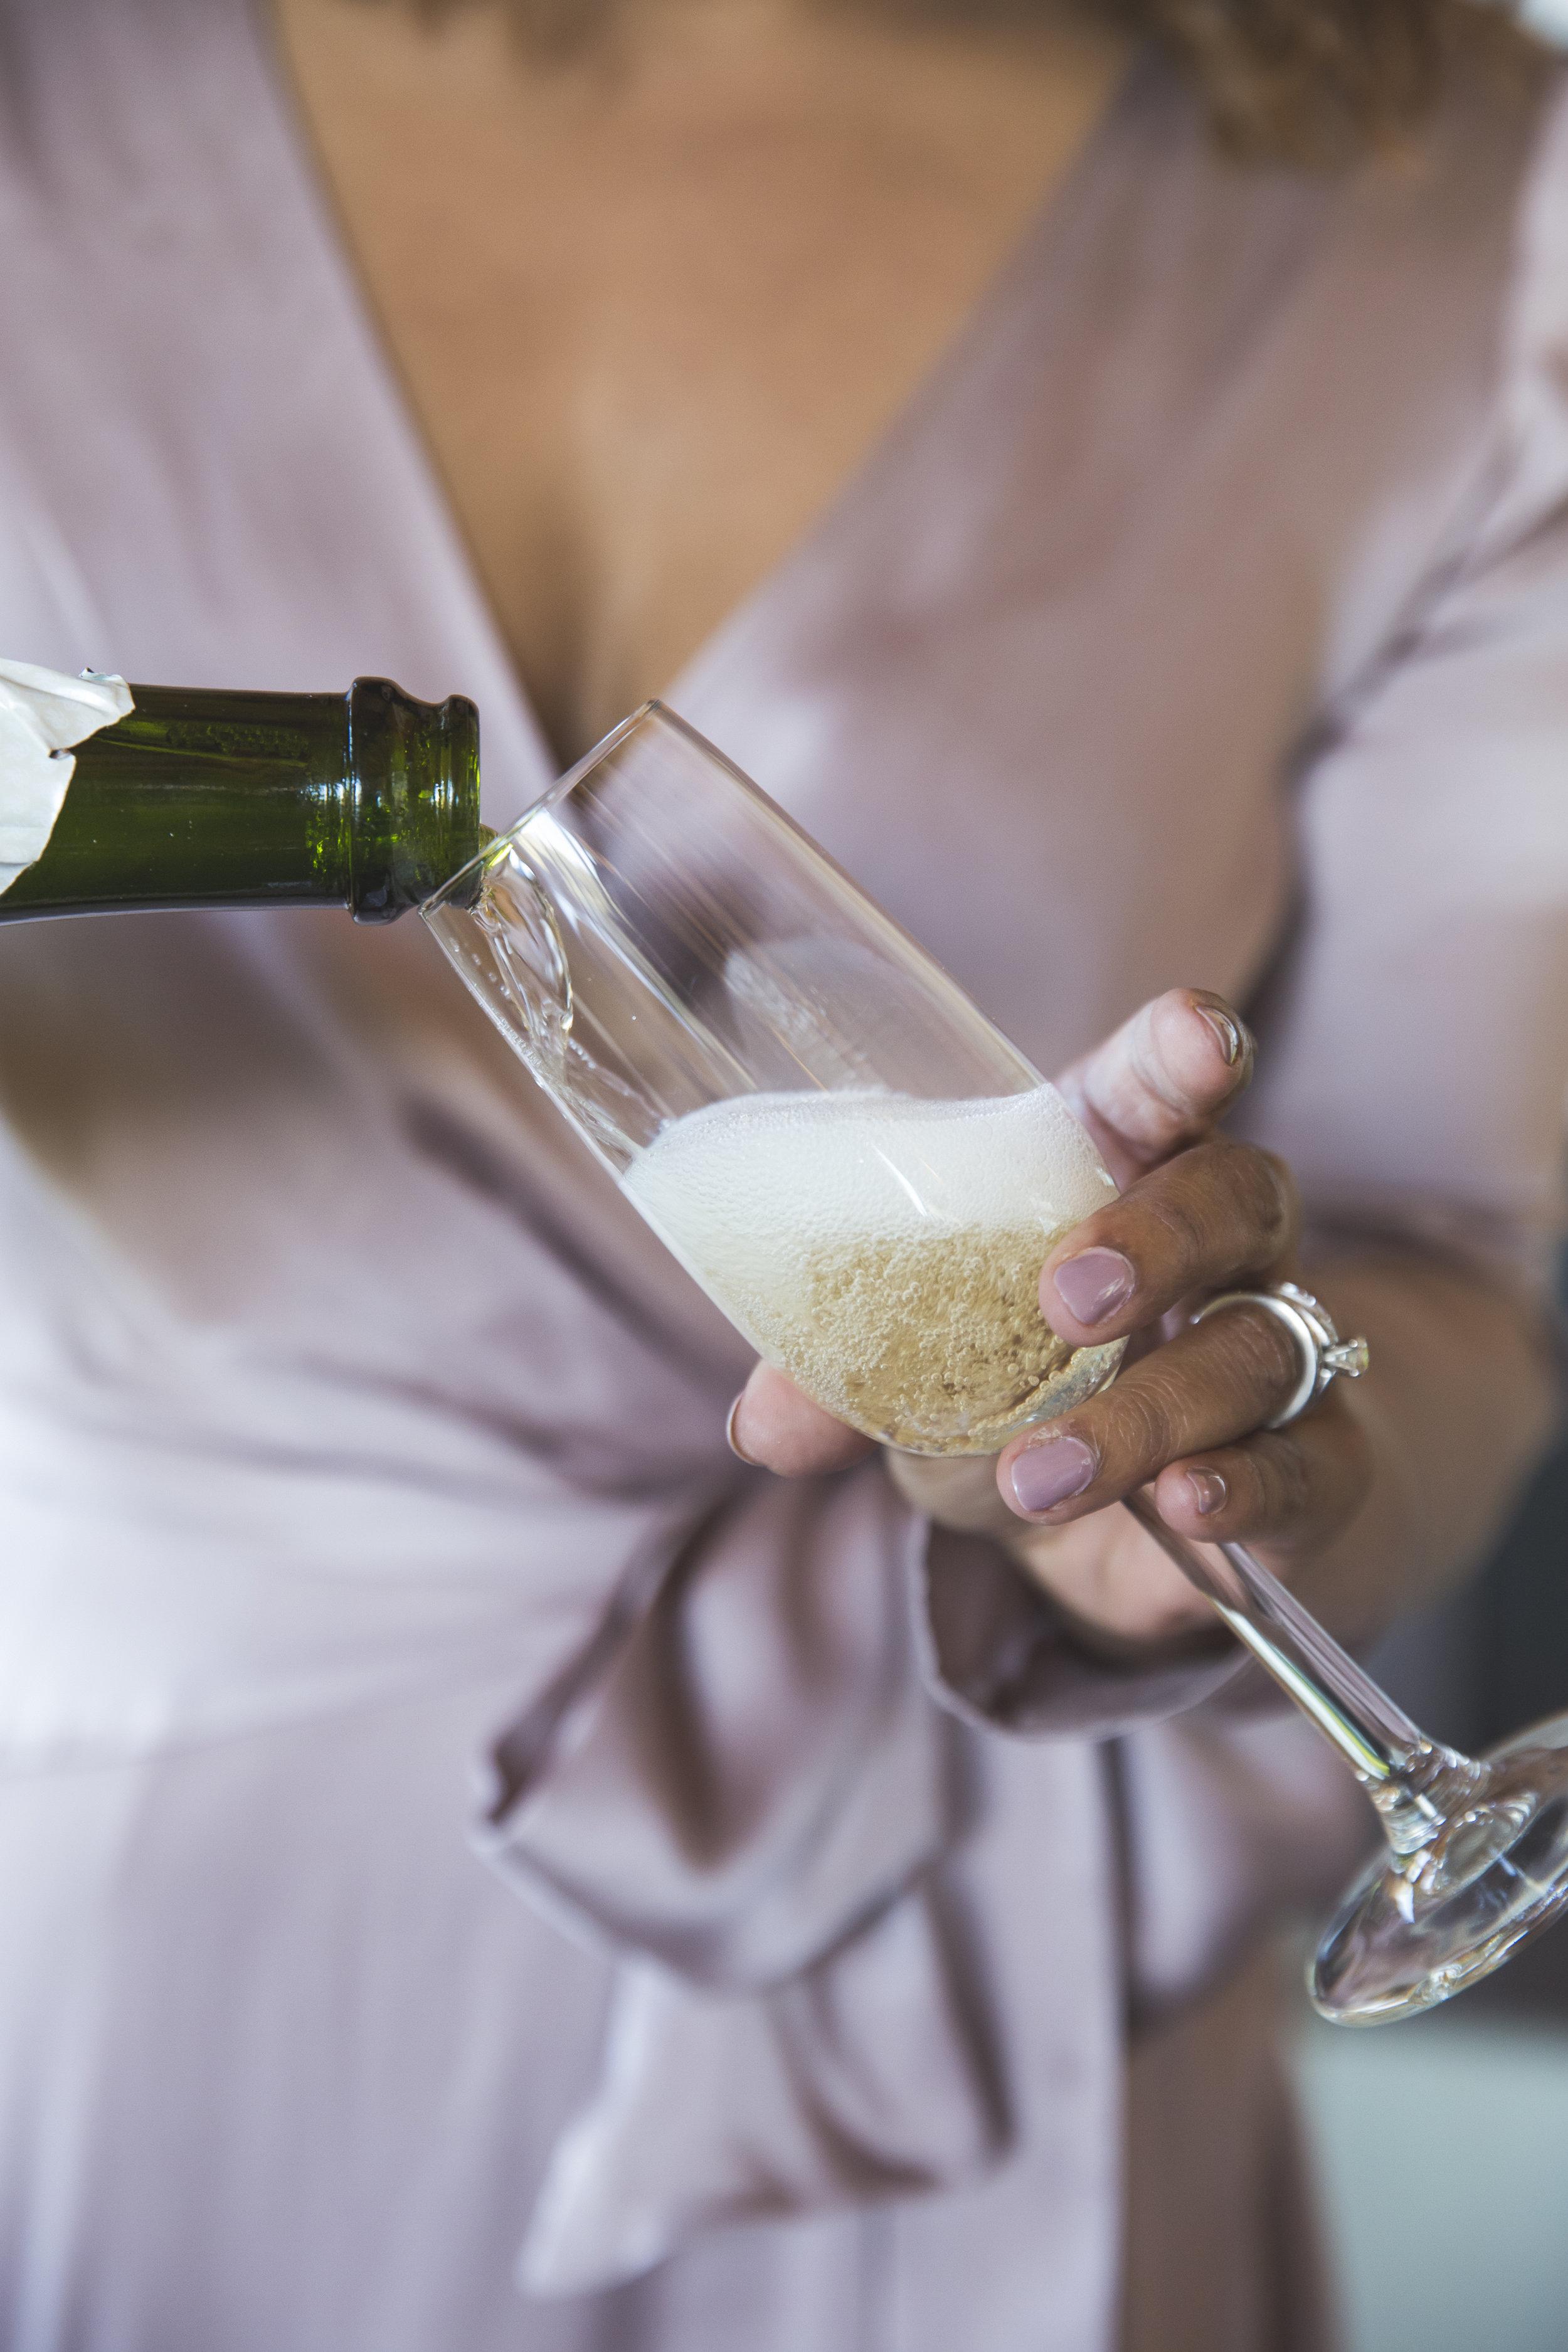 Pop-Up-Bar-Service-Gold-Coast-Wedding.Jpg